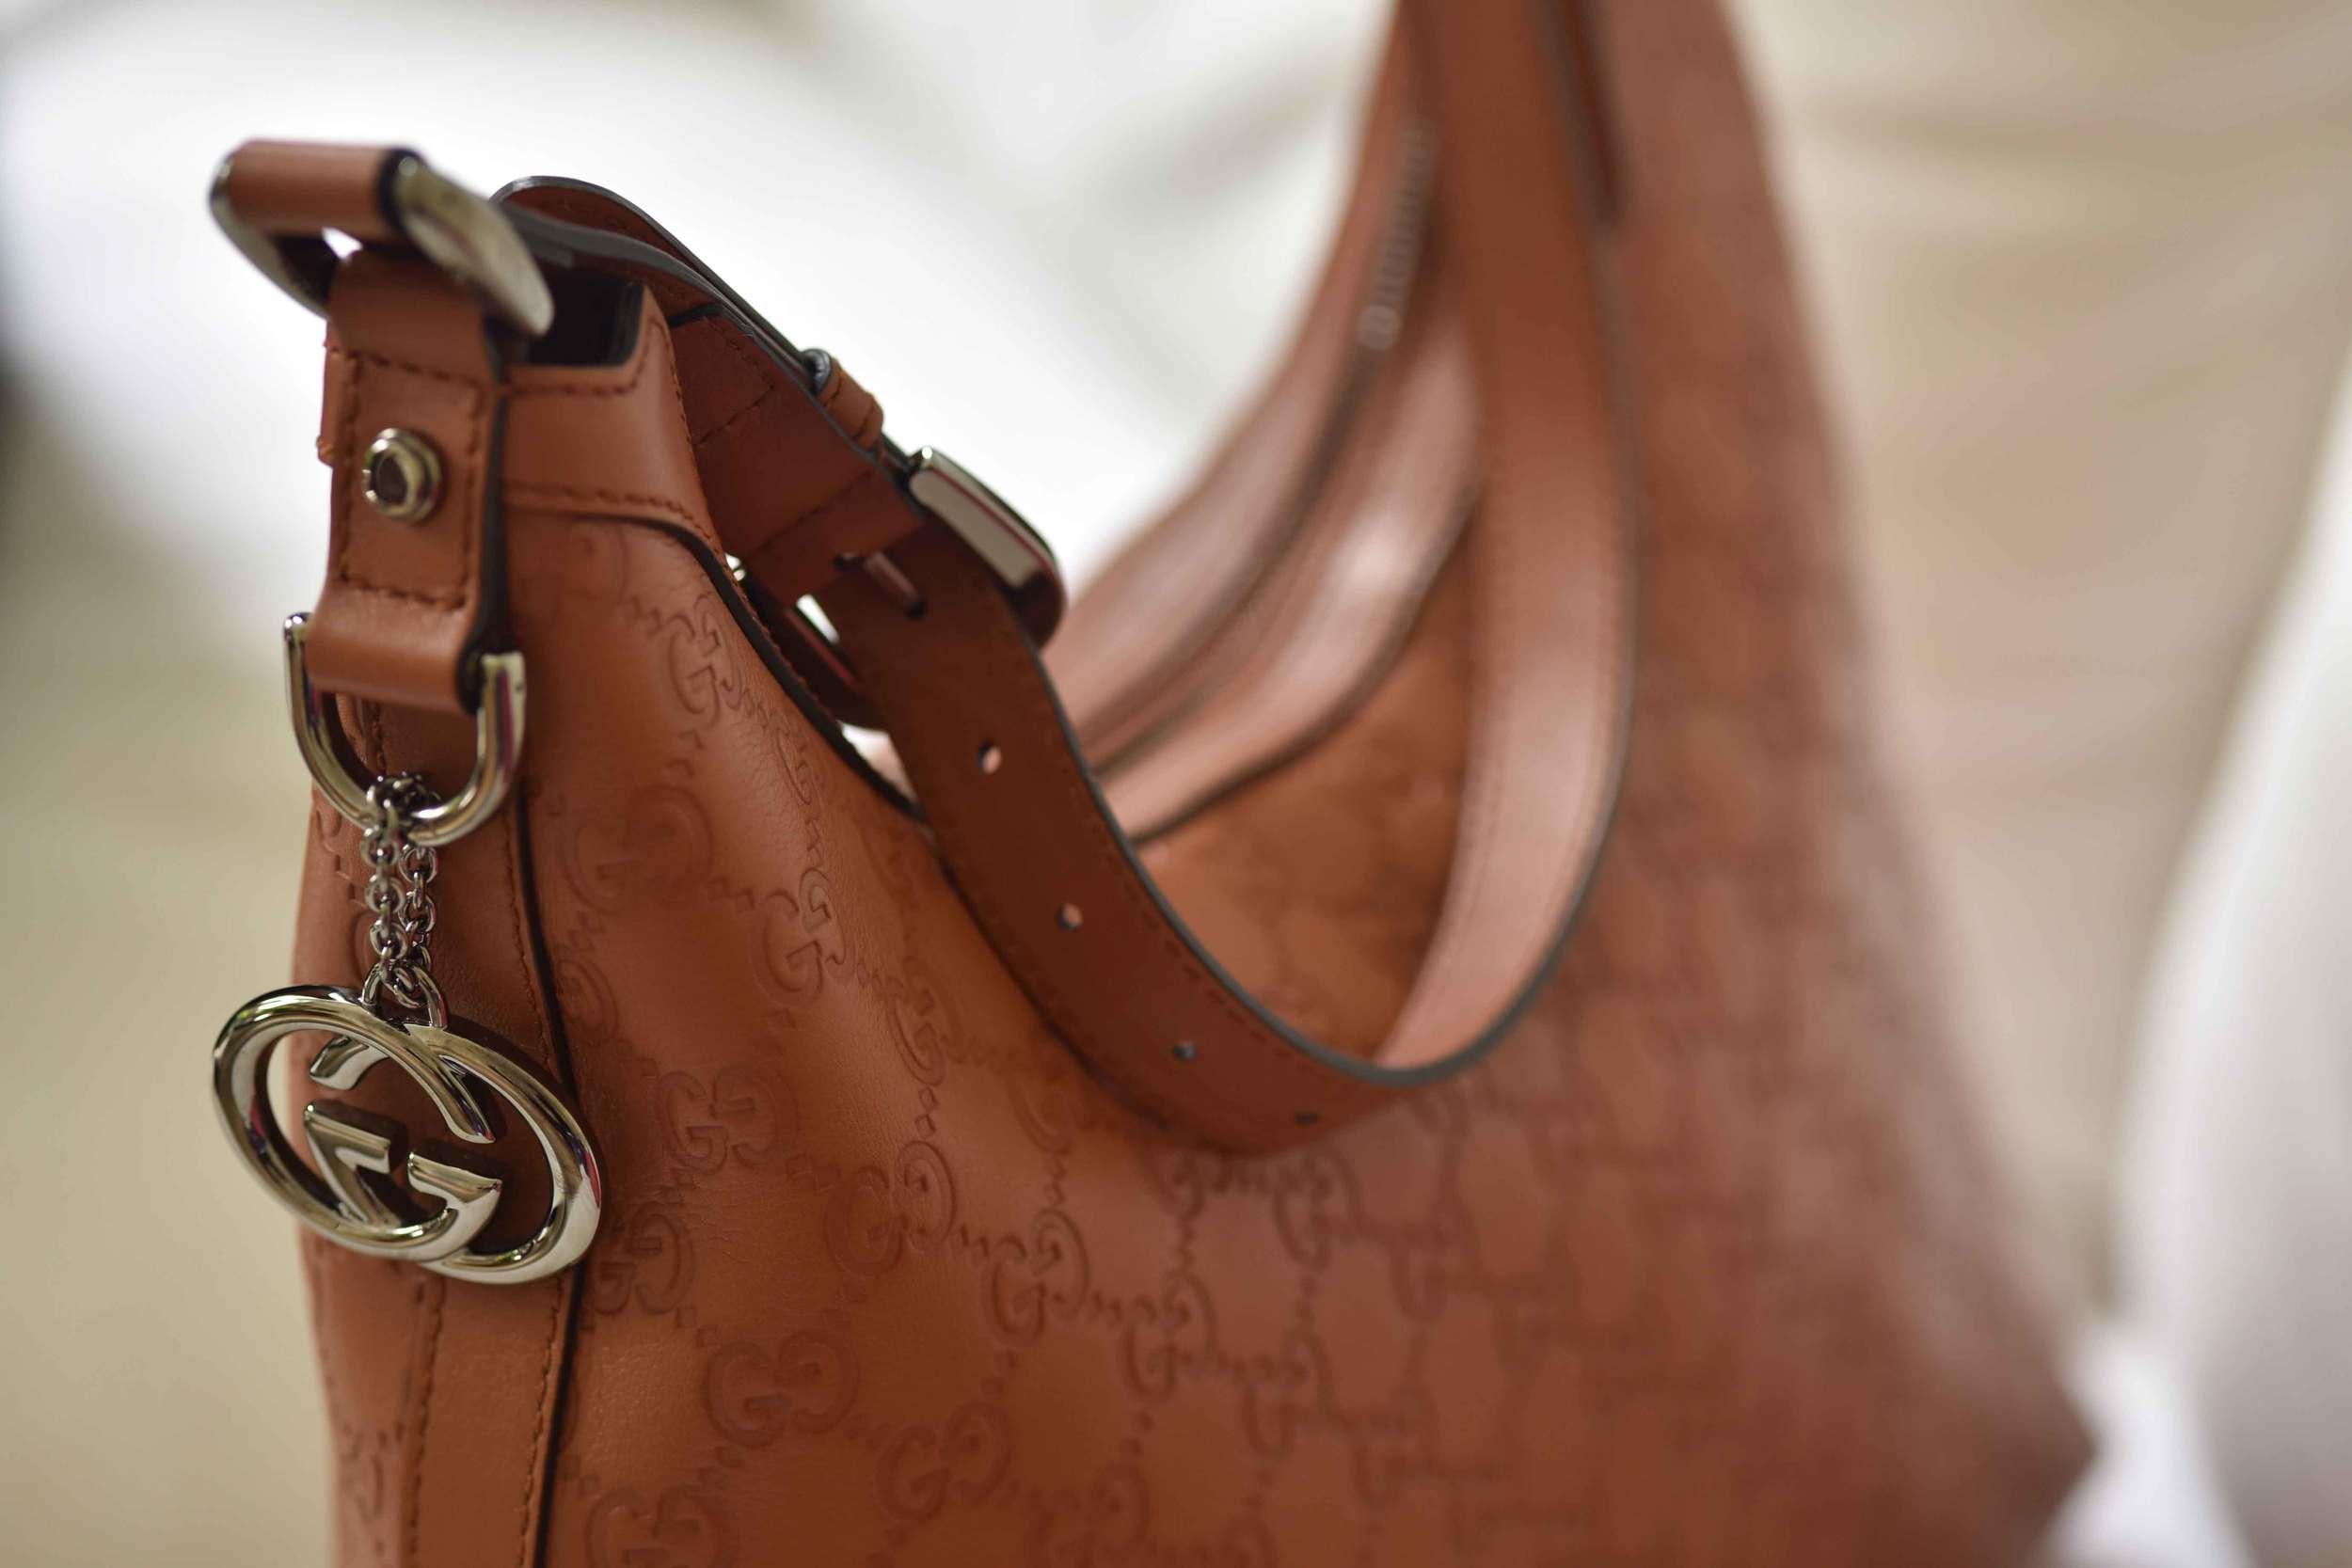 Gucci everyday bag in tan color. Image©sourcingstyle.com, Photo: Nicola Nolting.